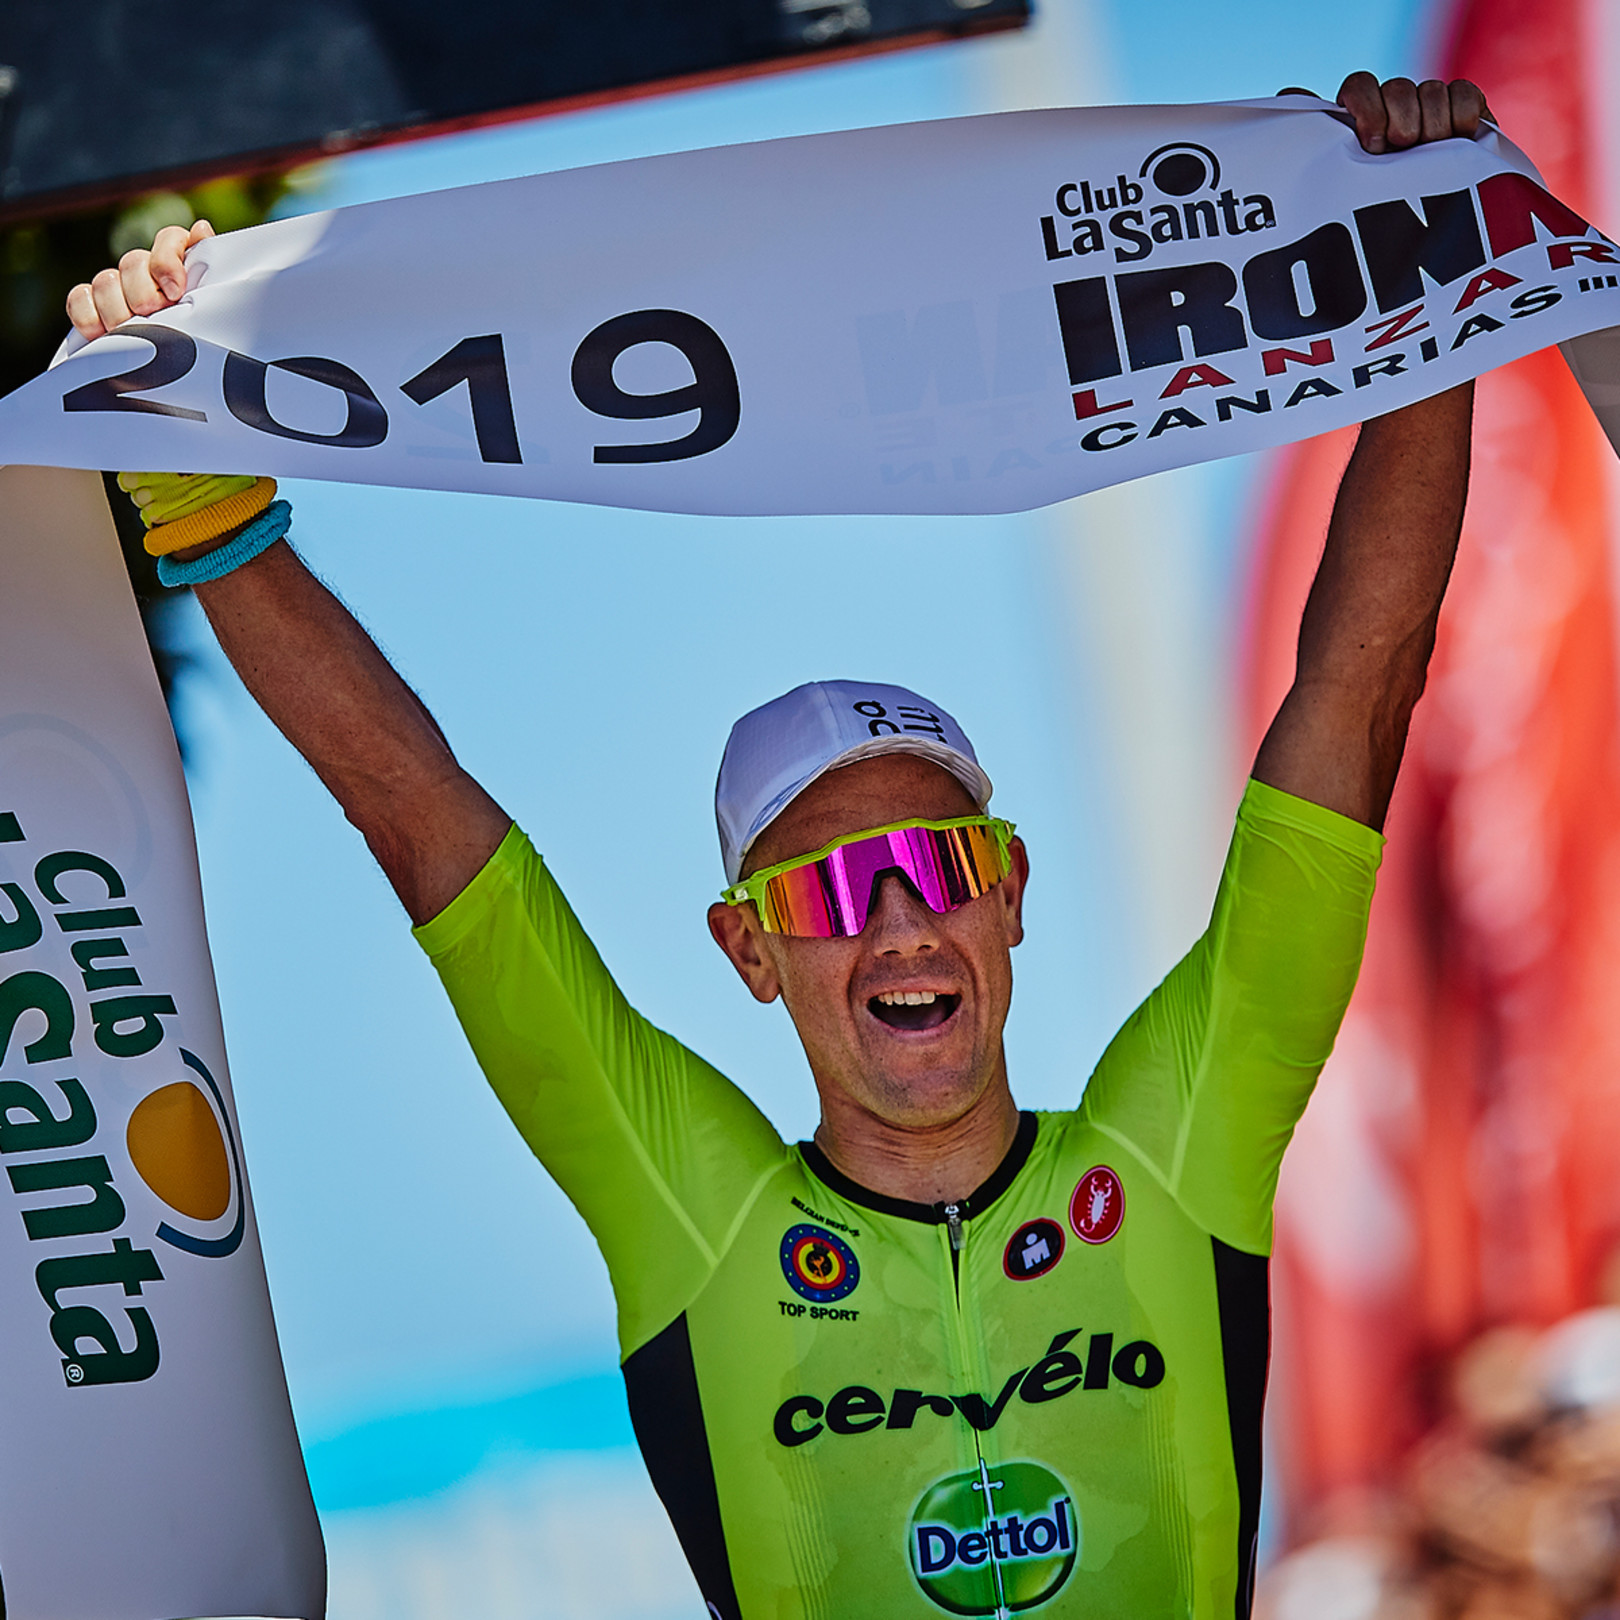 982845432cc8 Frederik Van Lierde wins Ironman Lanzarote